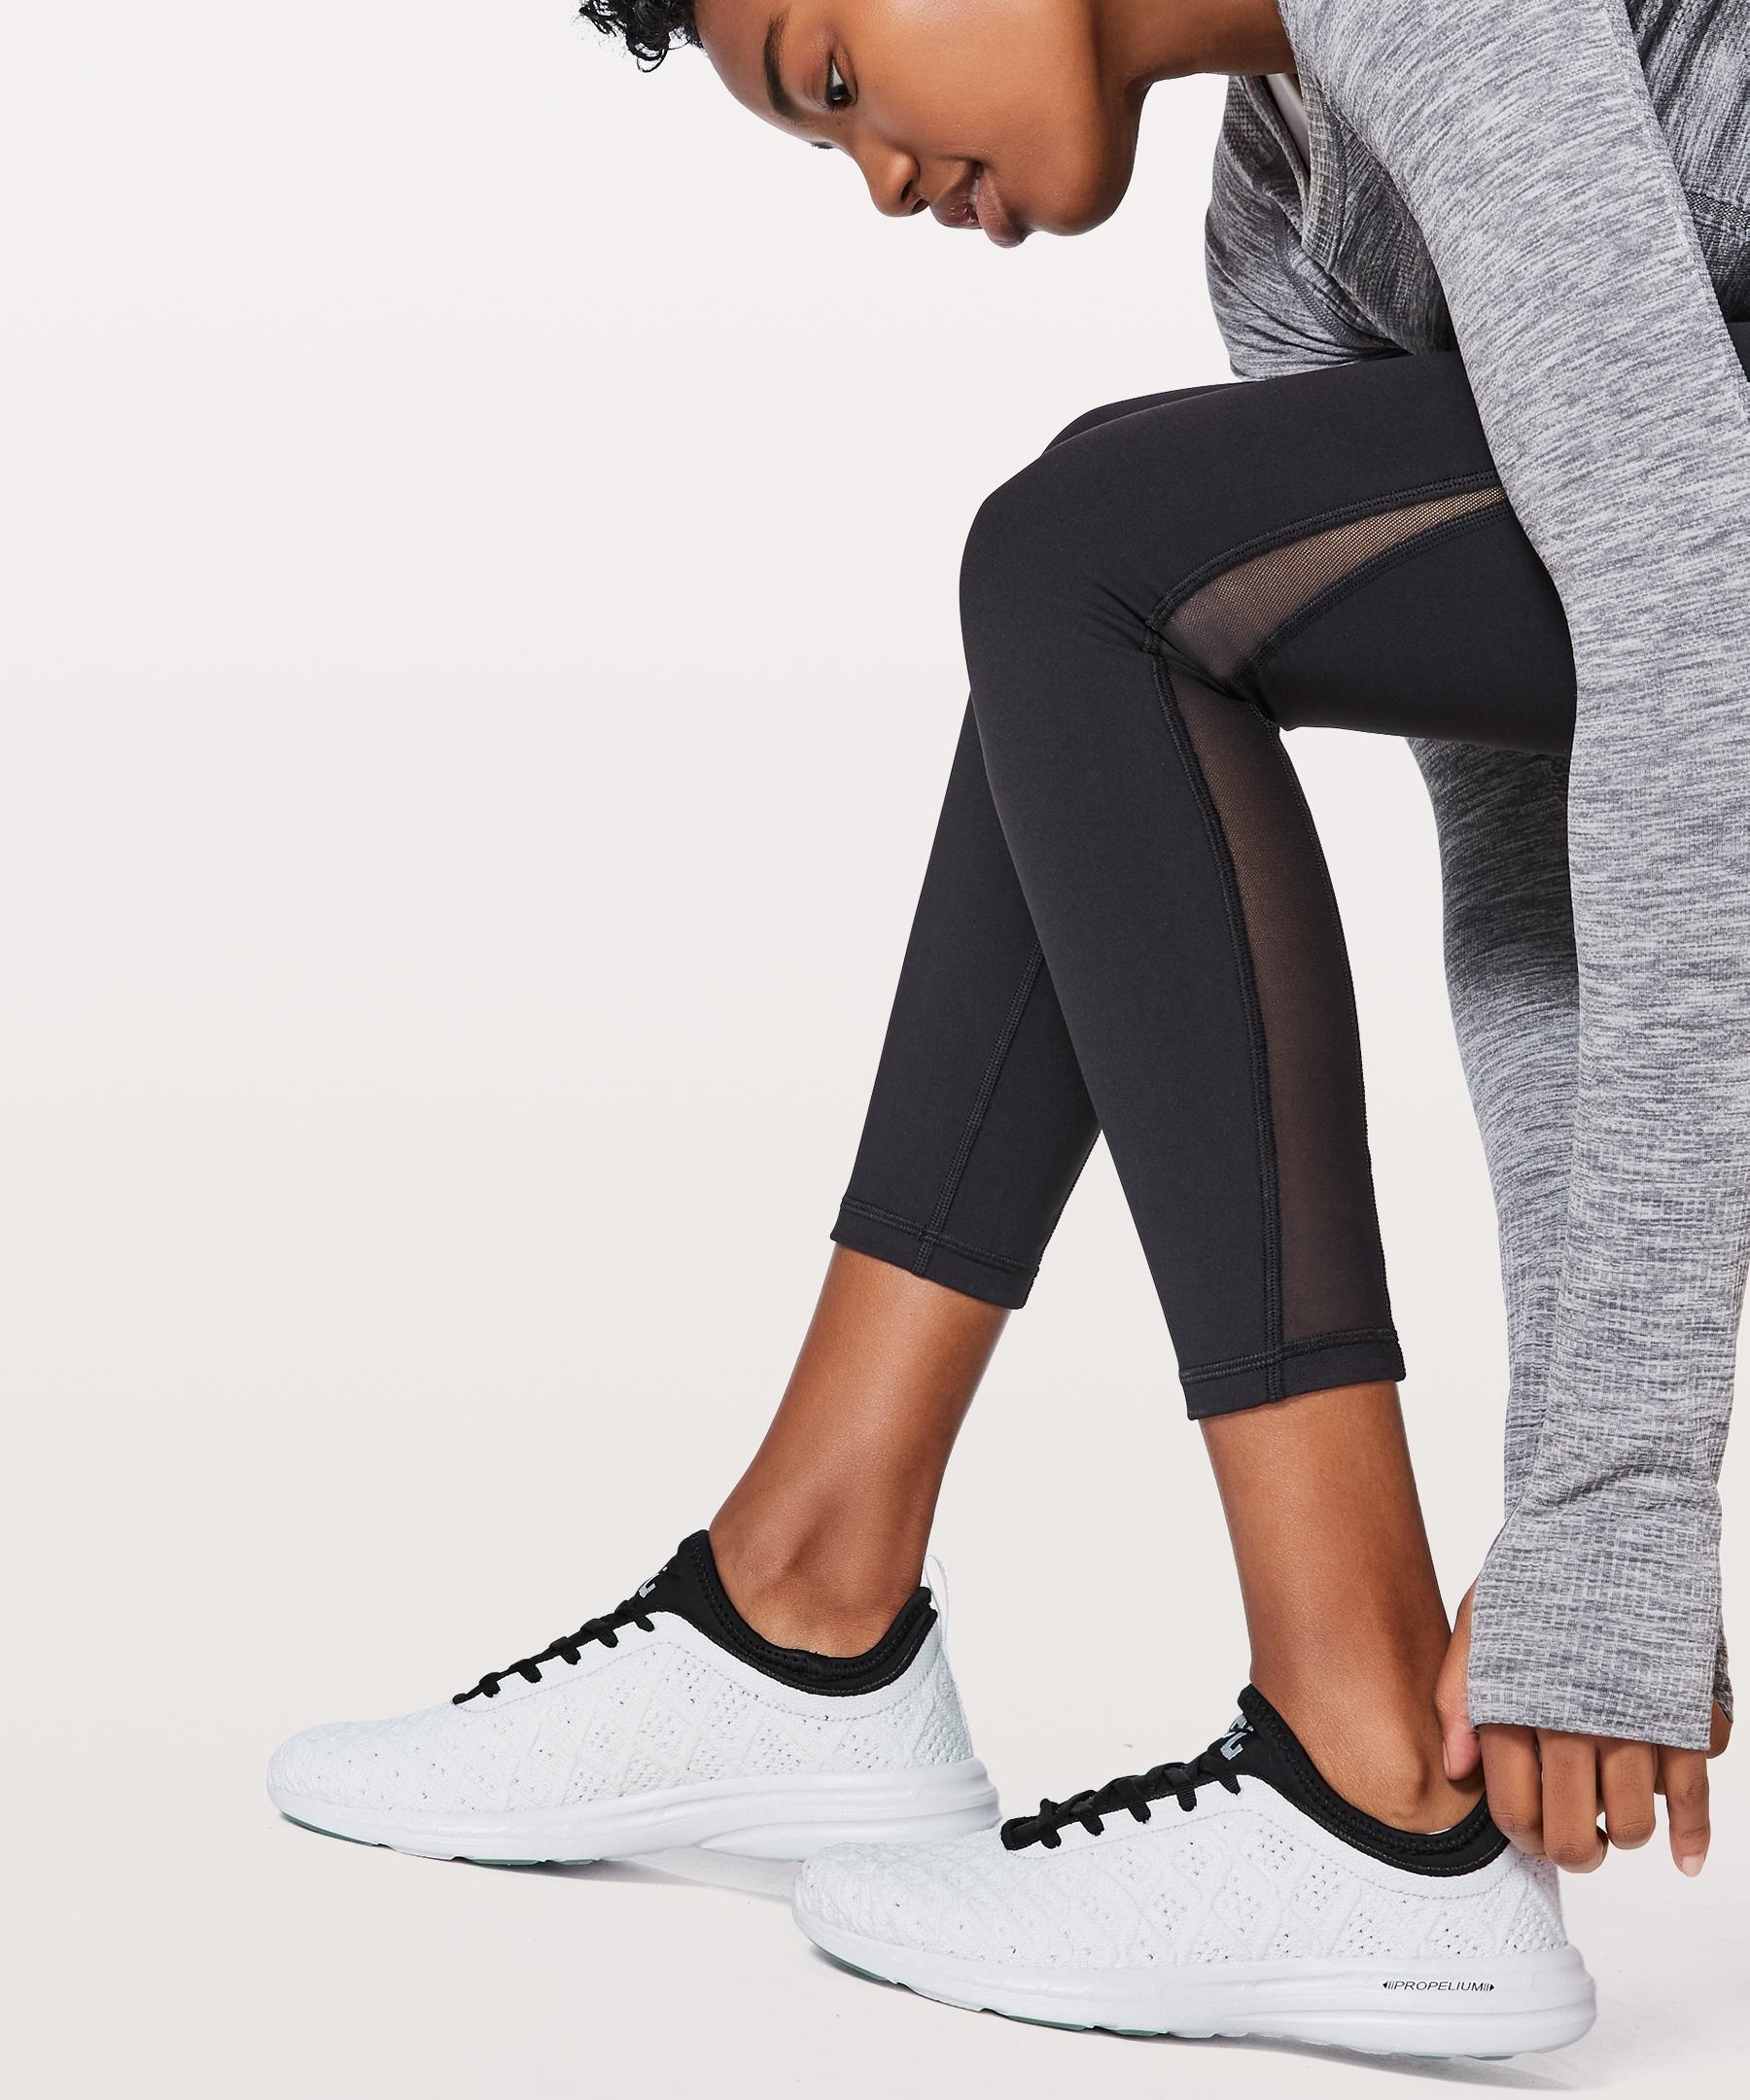 Women's TechLoom Phantom Shoe